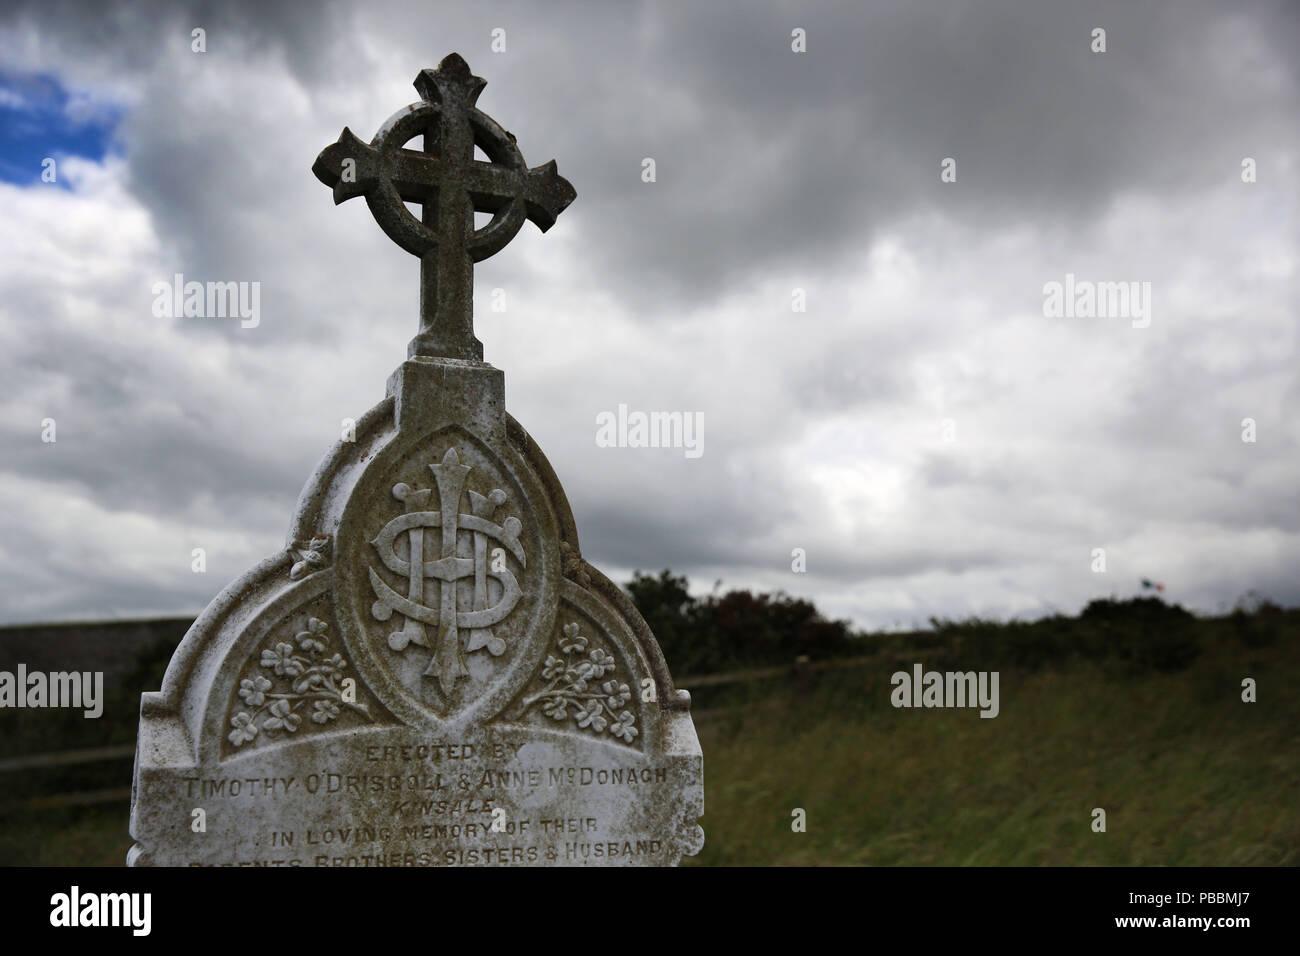 Cork Christian Dating Site, Cork Christian Personals, Cork Christian